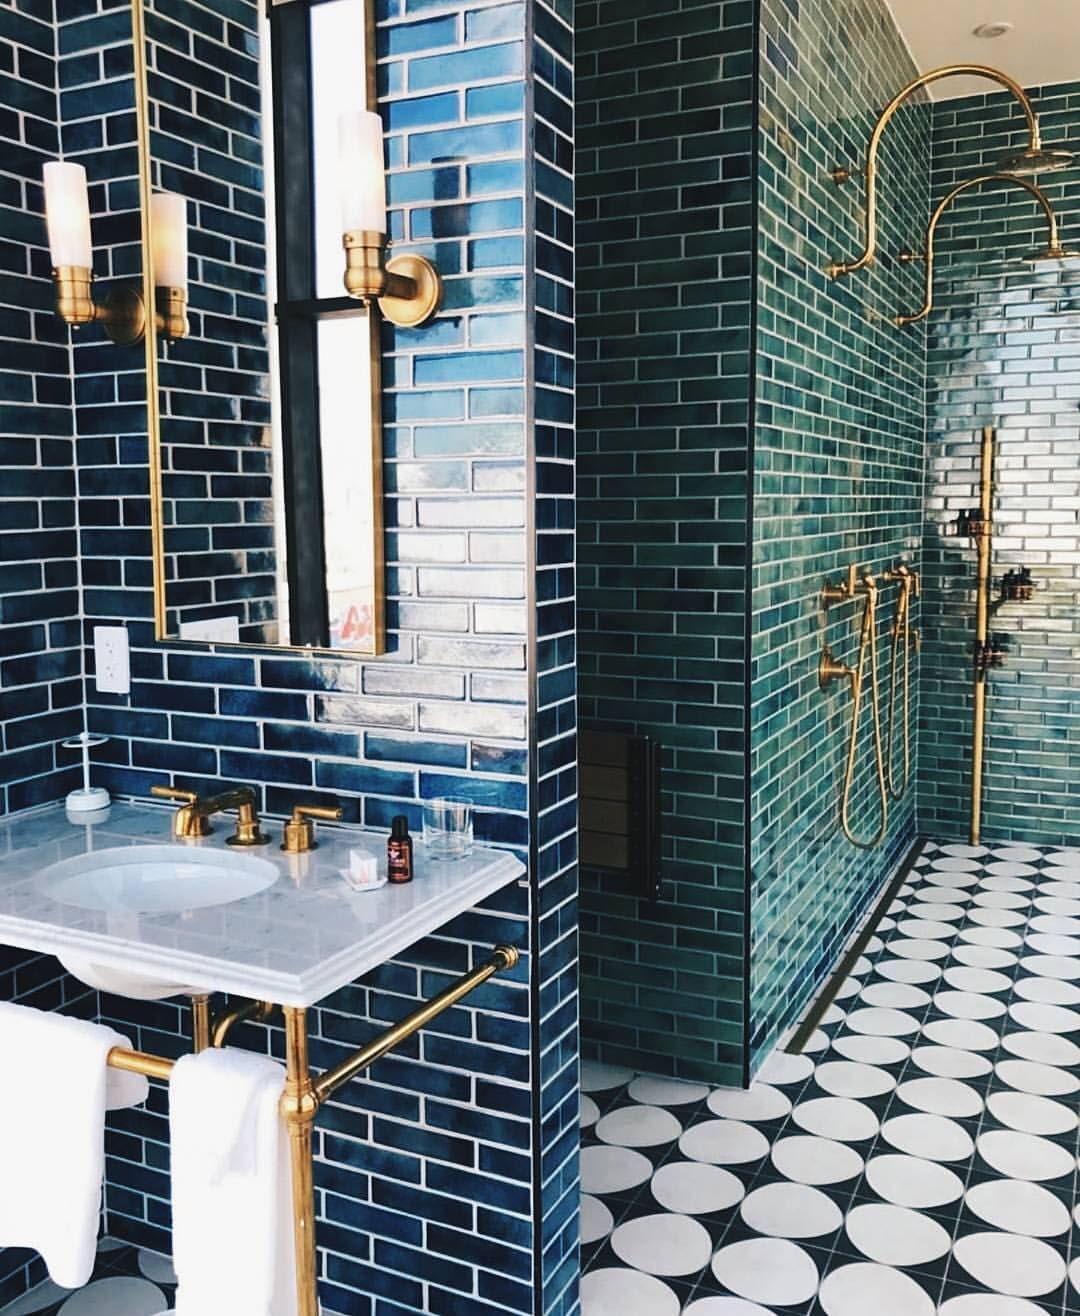 31 3 Mil Curtidas 115 Comentarios Na Kd Com Nothing But Style Nakdfashion No Instagram White Bathroom Tiles Bathroom Interior Design Bathroom Design